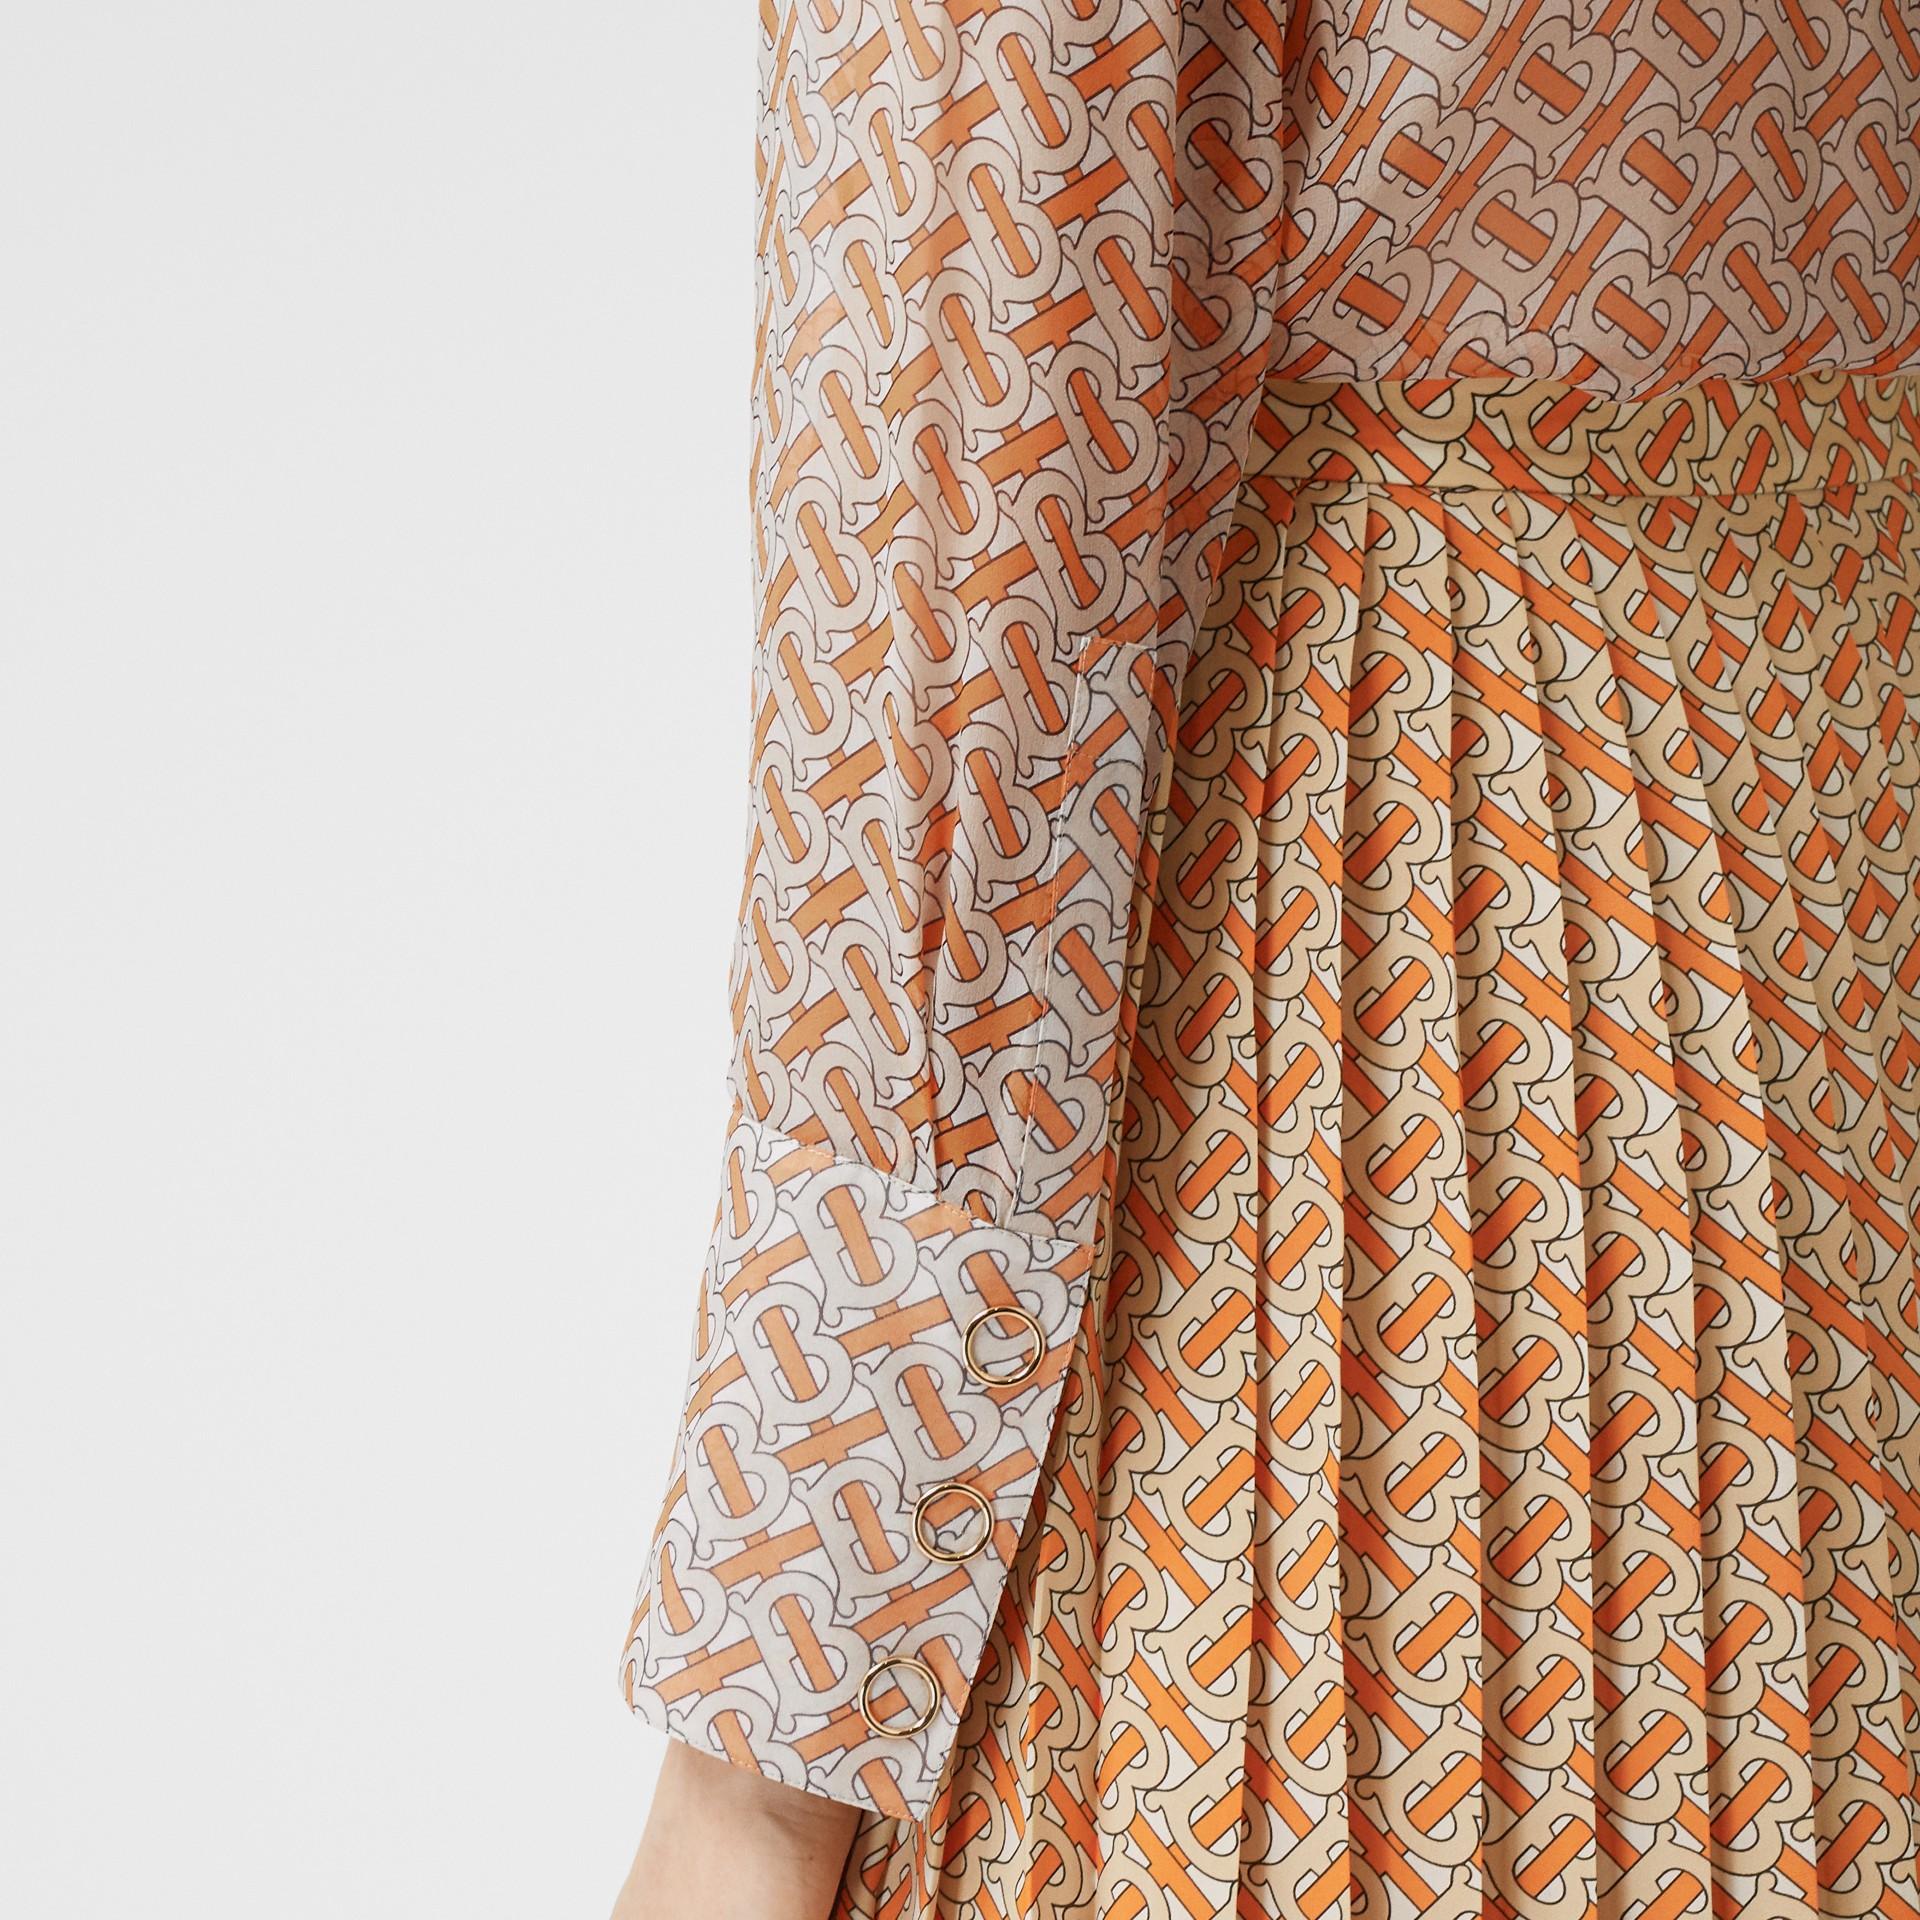 Monogram Print Silk Chiffon Pussy-bow Blouse in Bright Orange - Women | Burberry Canada - gallery image 4